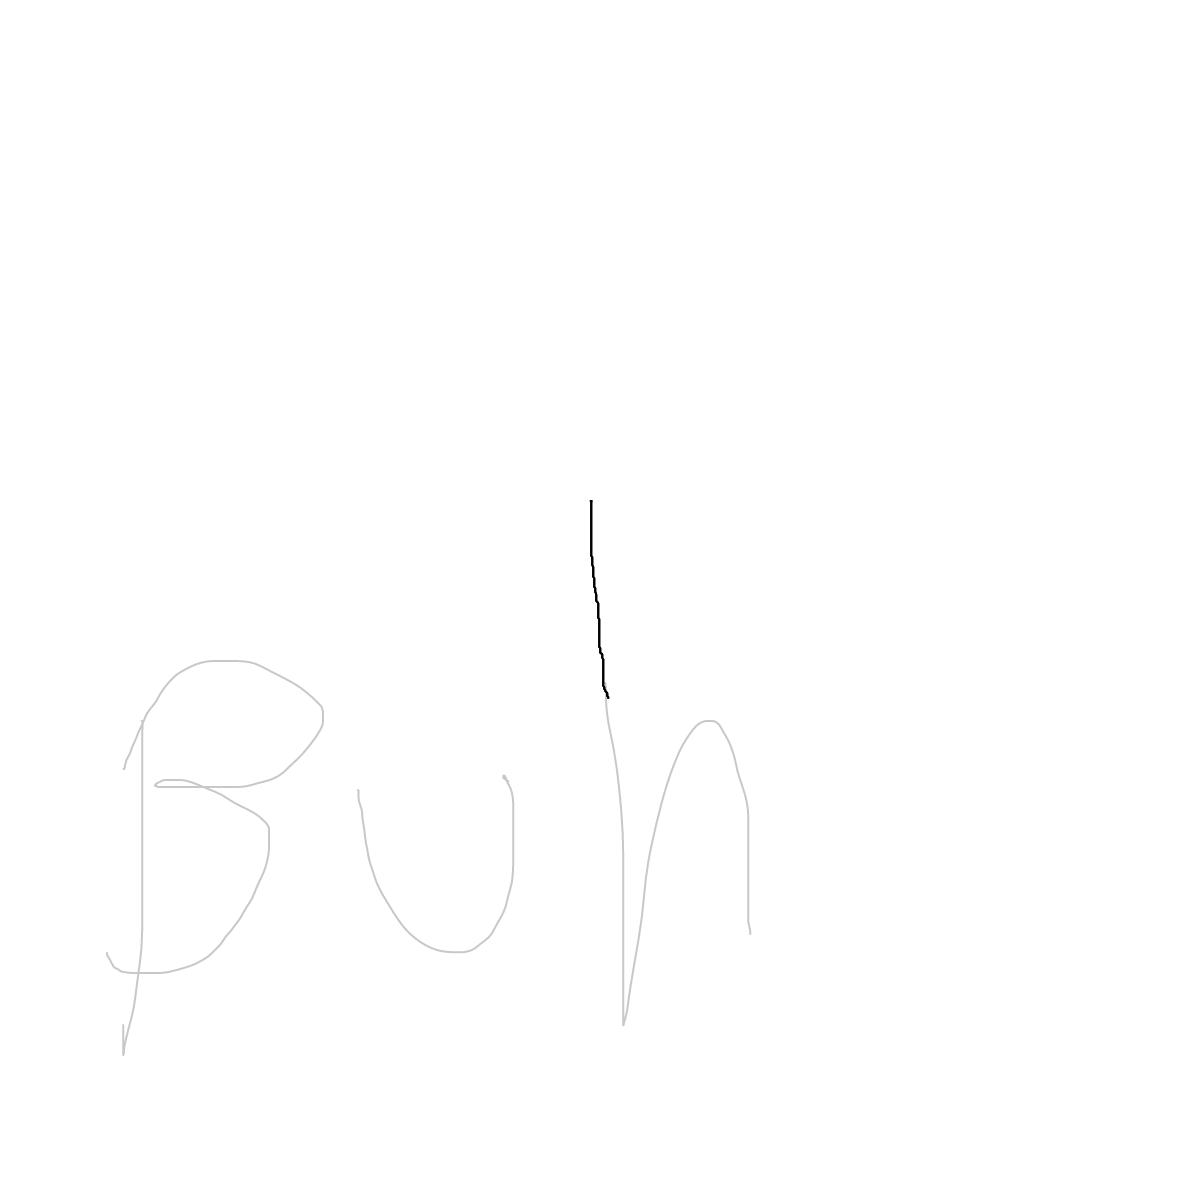 BAAAM drawing#16542 lat:-17.9951248168945300lng: 177.5267791748047000